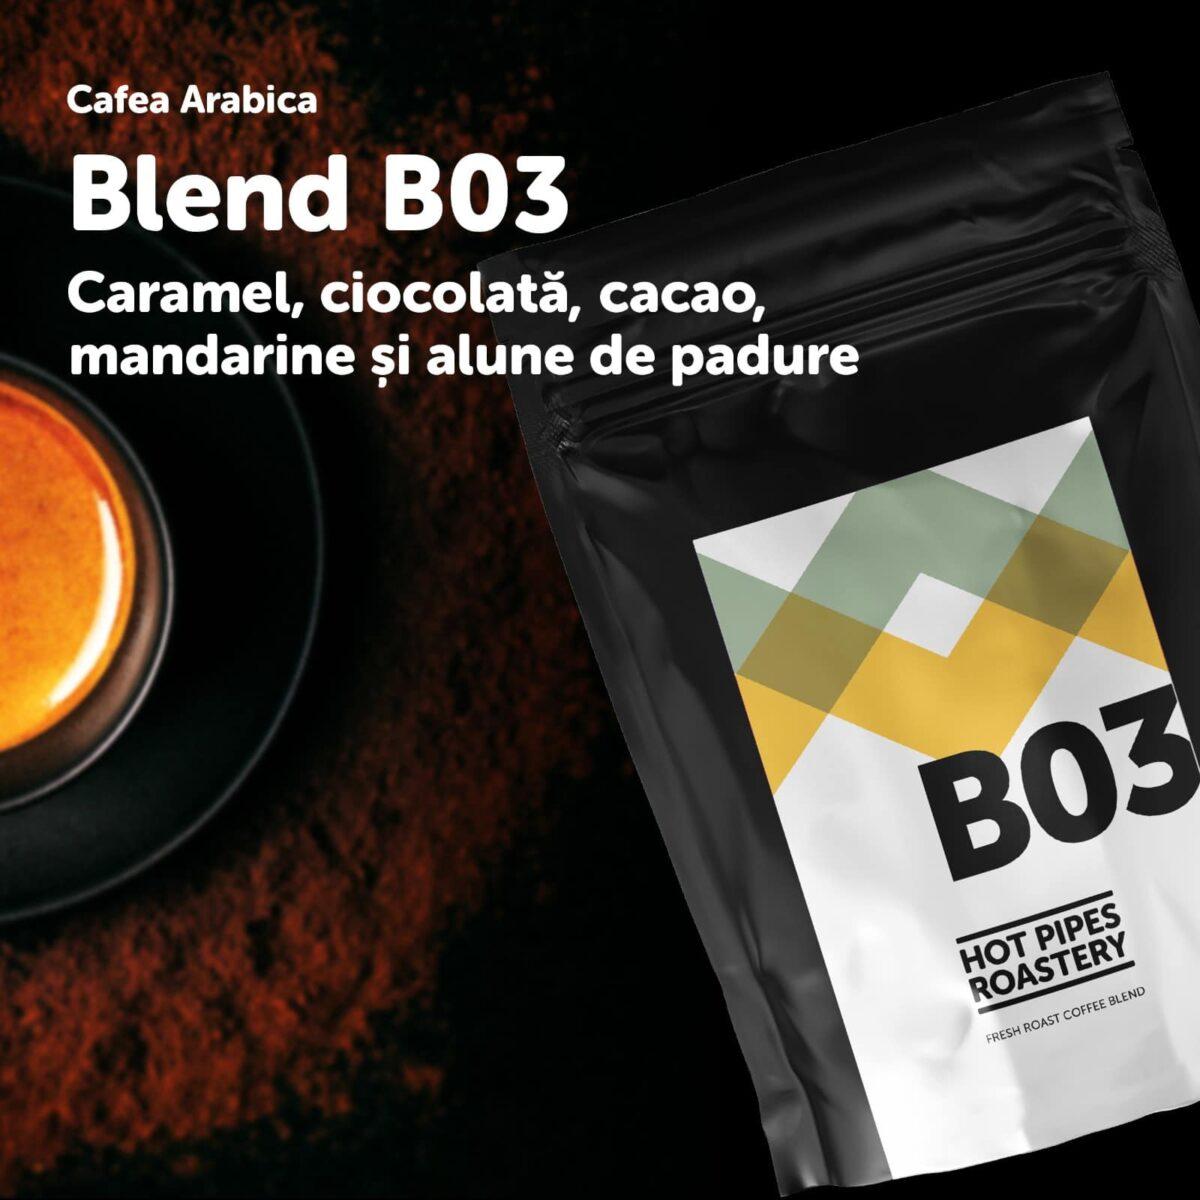 blend B03 1